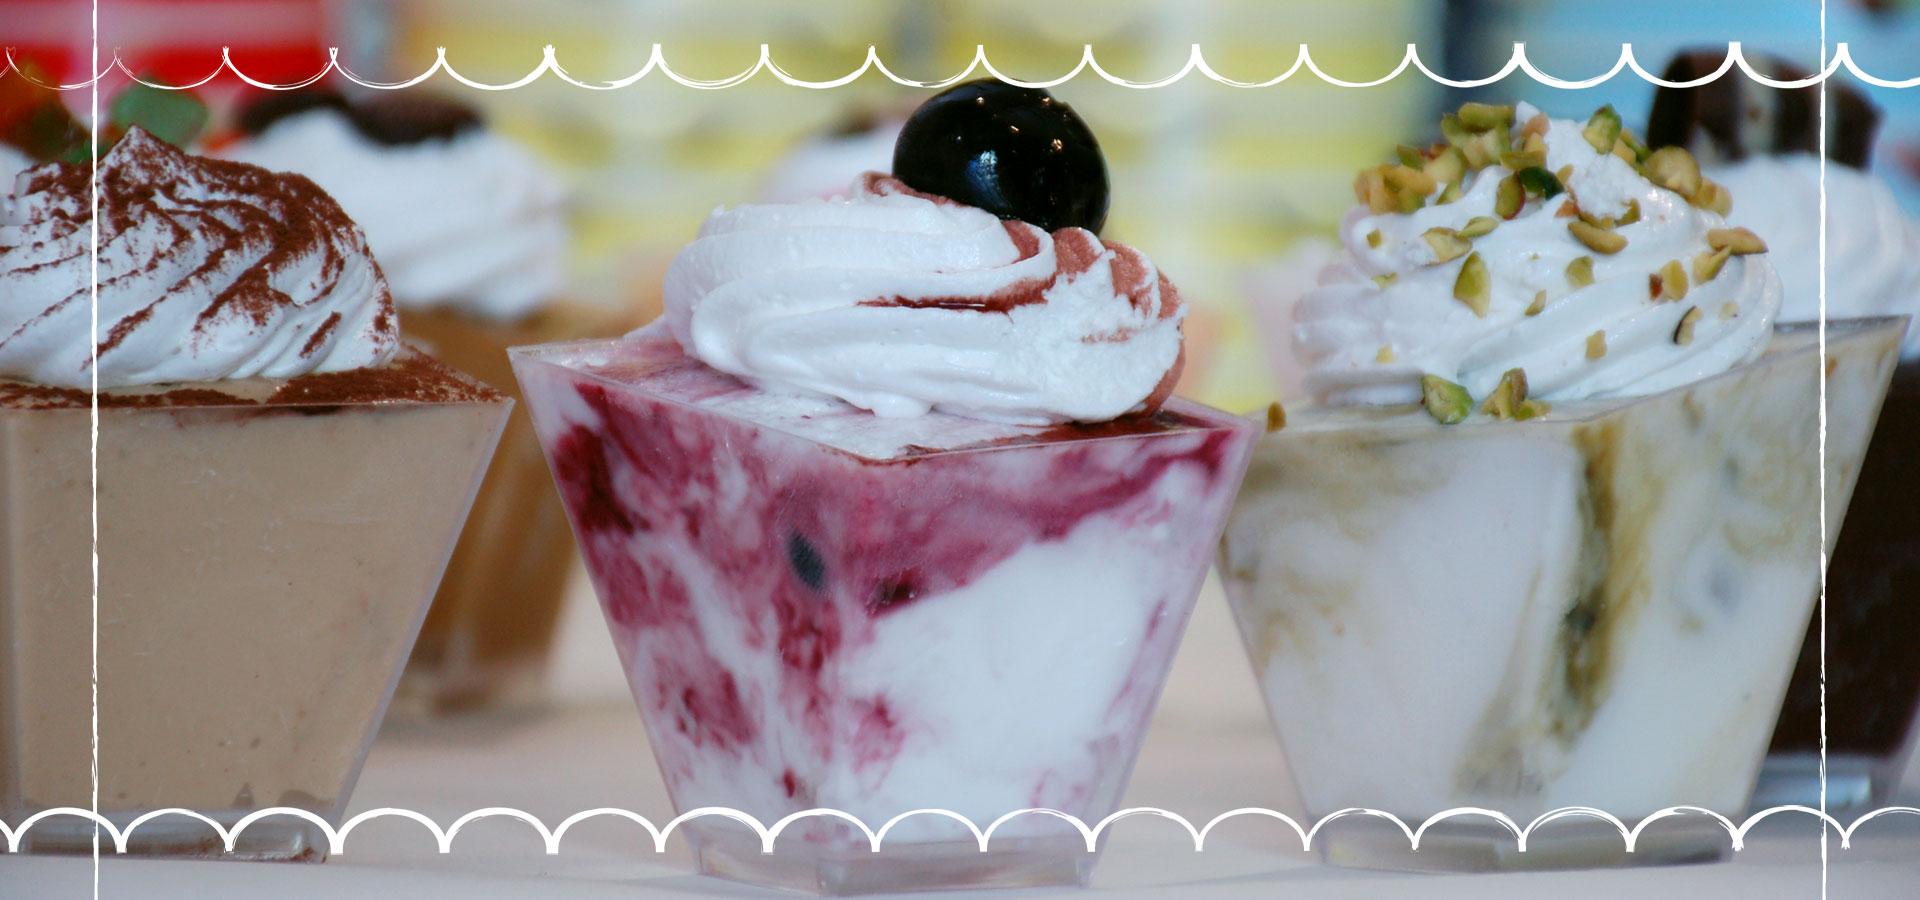 Gelateria Millennium, monoporzioni gelato artigianale a Roma Prati